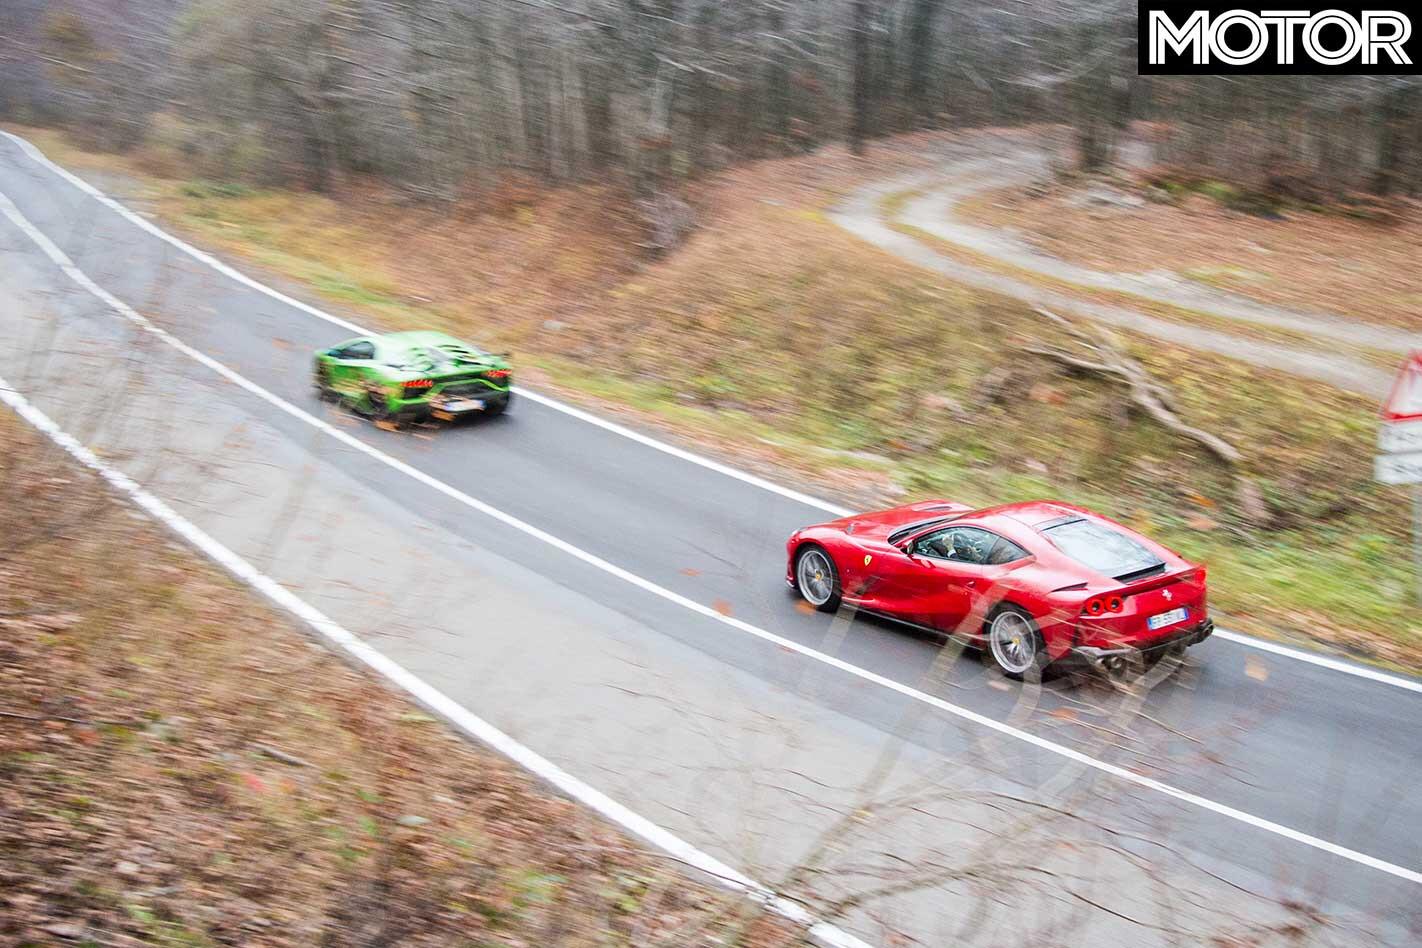 2019 Lamborghini Aventador SVJ Vs Ferrari 812 Superfast Comparison Drive Jpg